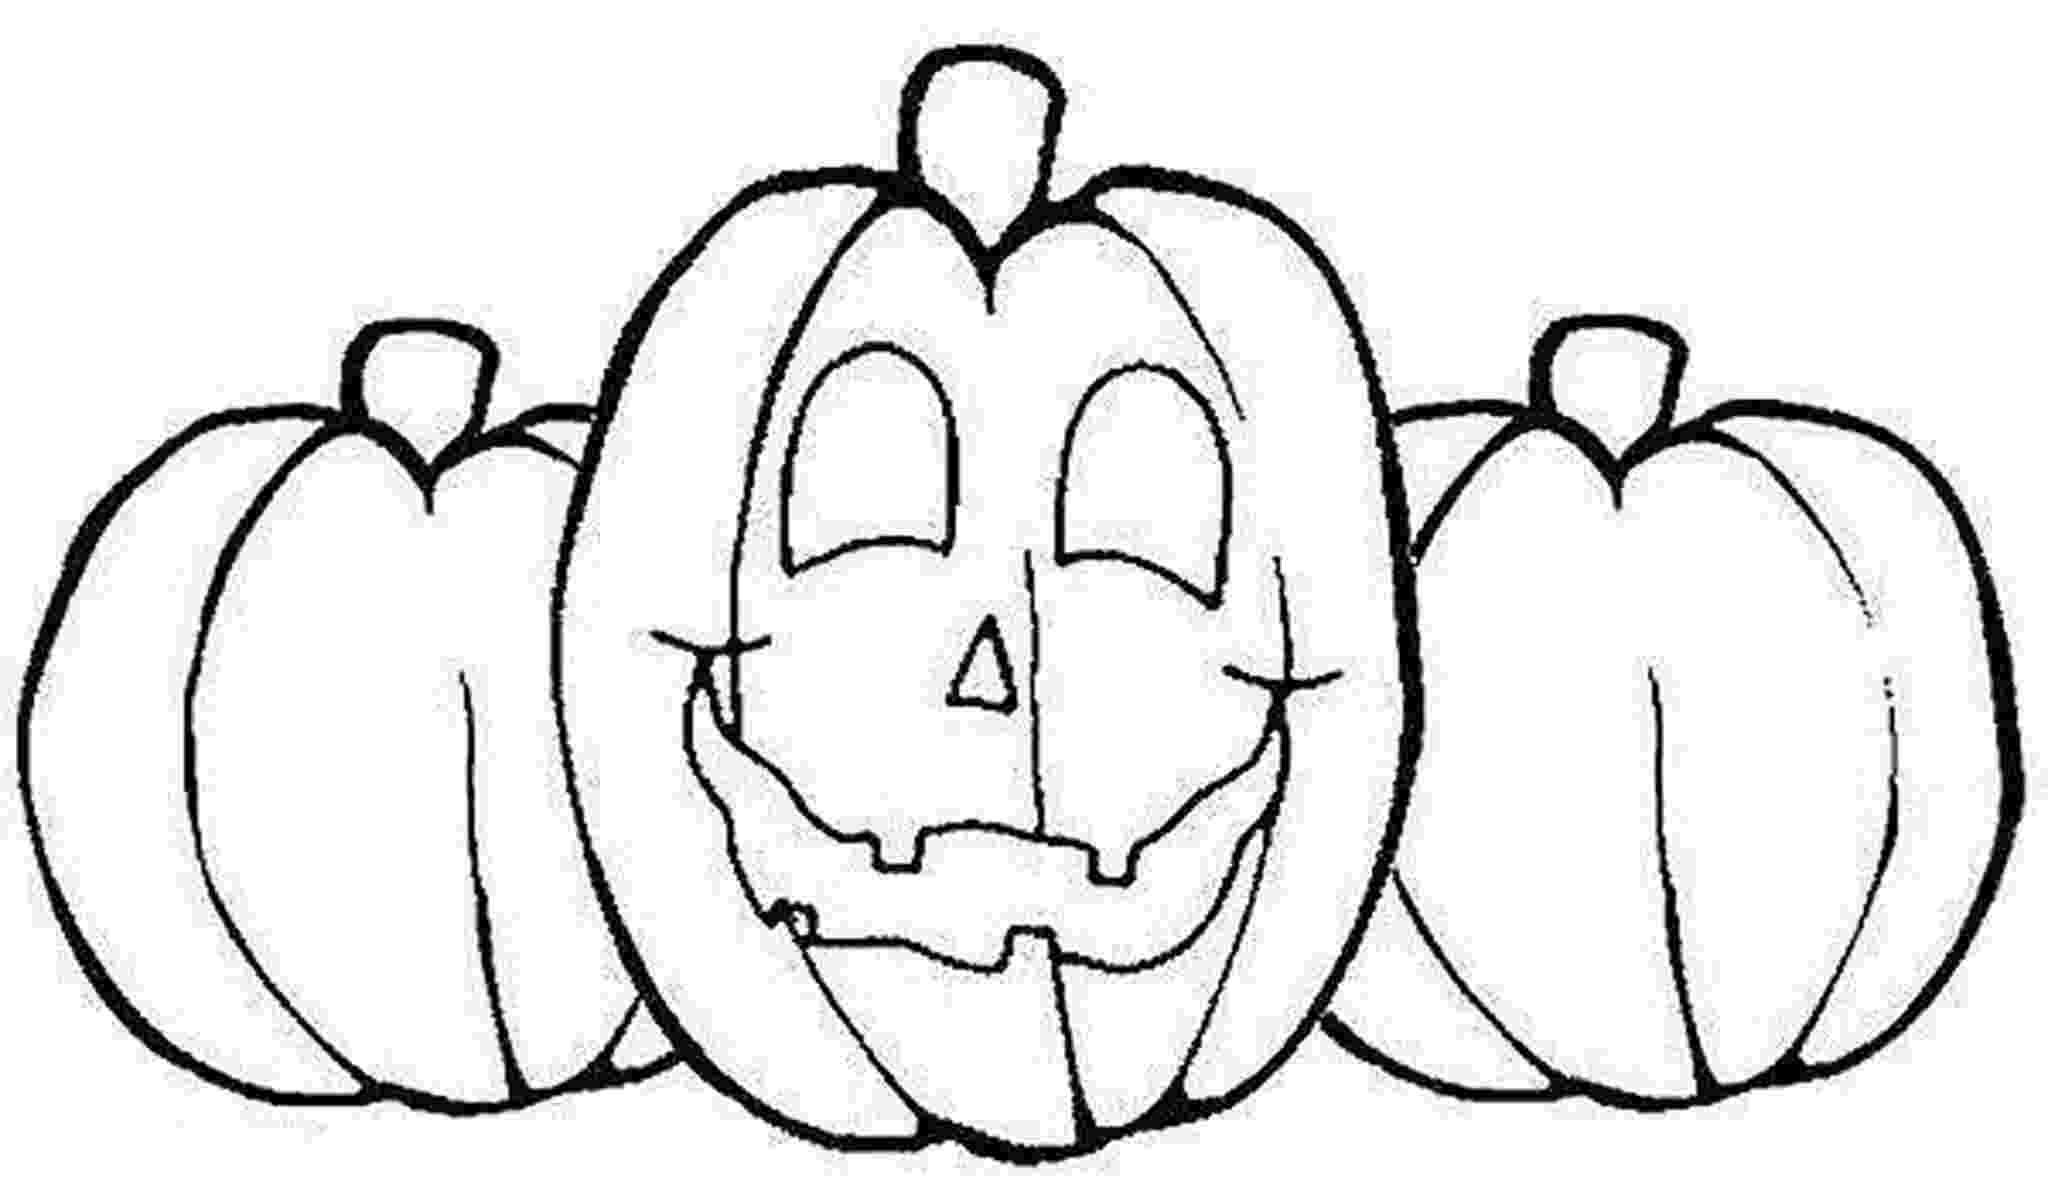 pumpkin coloring sheets printable pumpkin easy thanksgiving coloring pages printables pumpkin printable coloring sheets